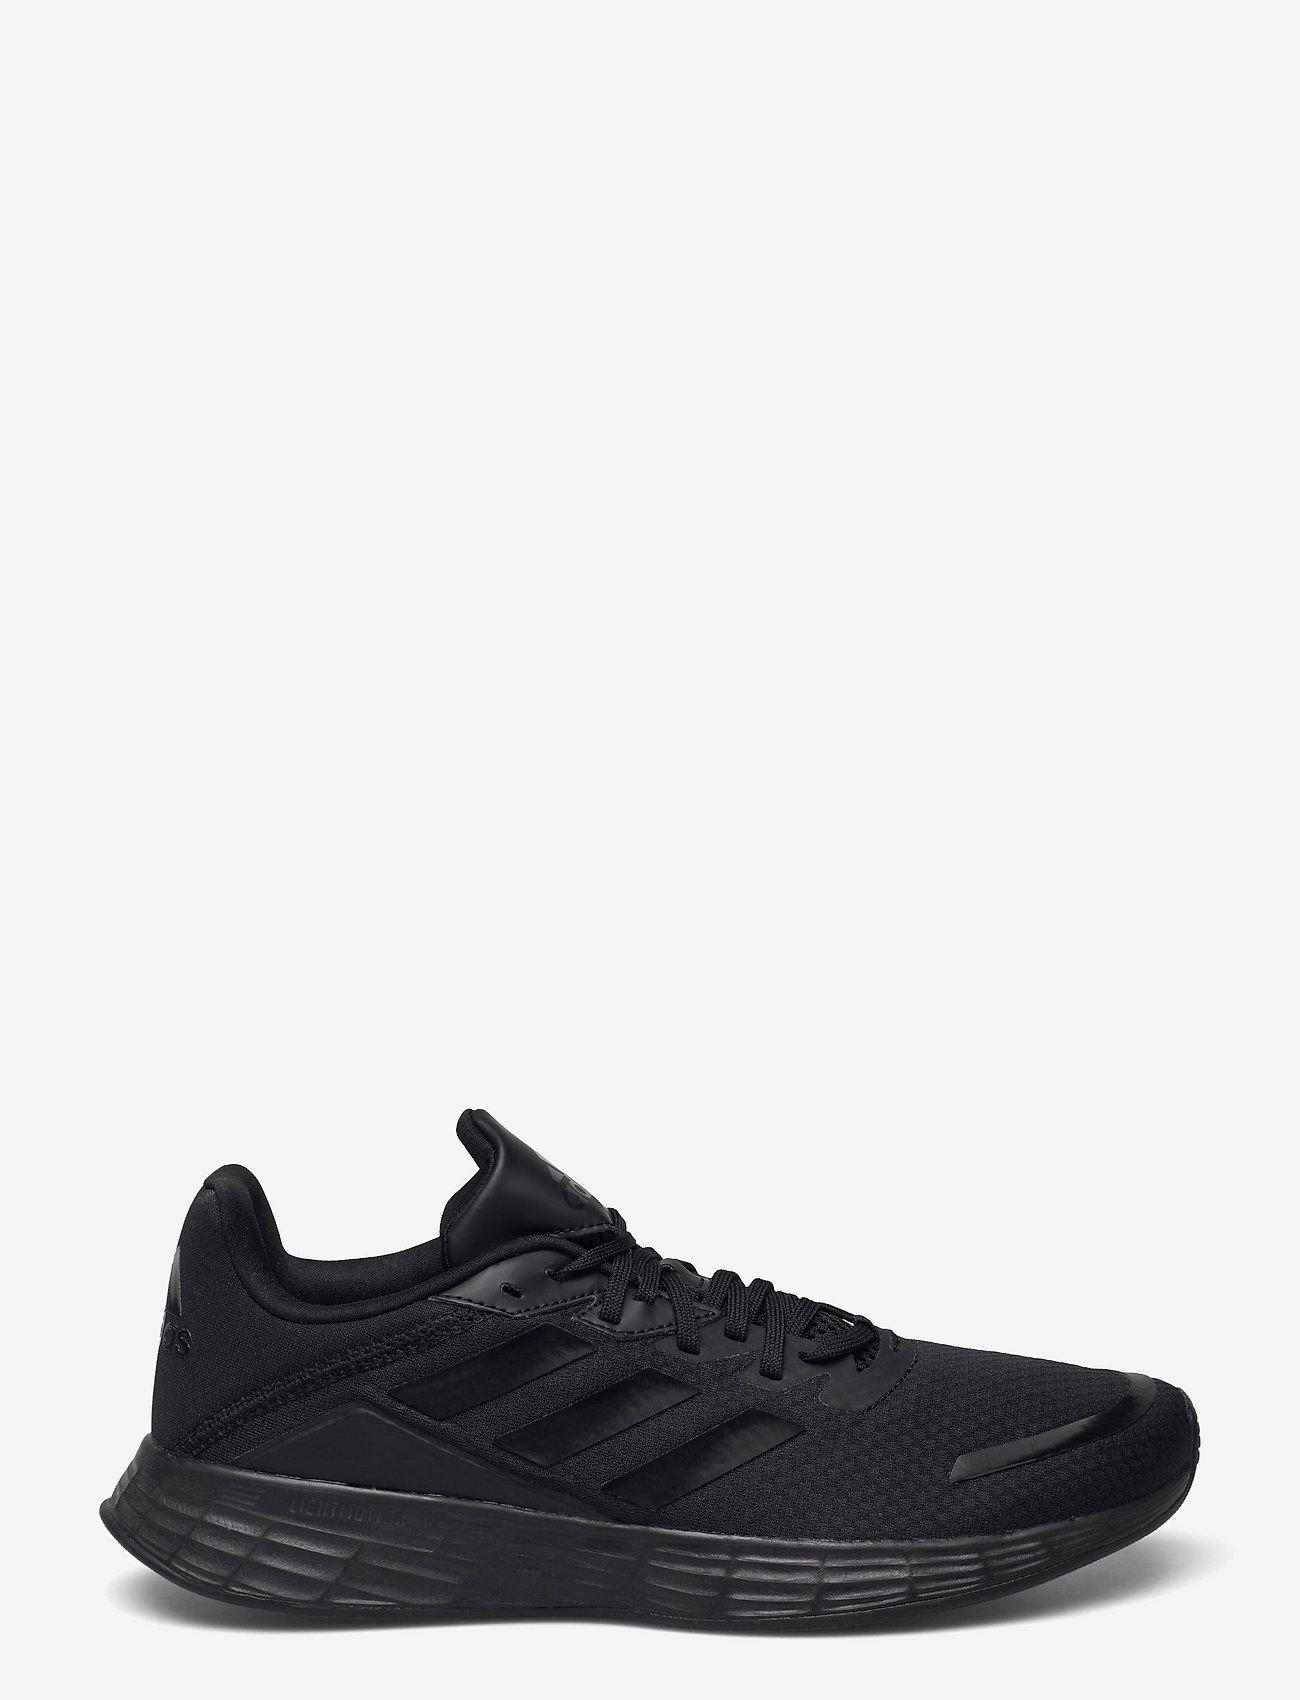 adidas Performance - Duramo SL  W - running shoes - cblack/cblack/carbon - 1